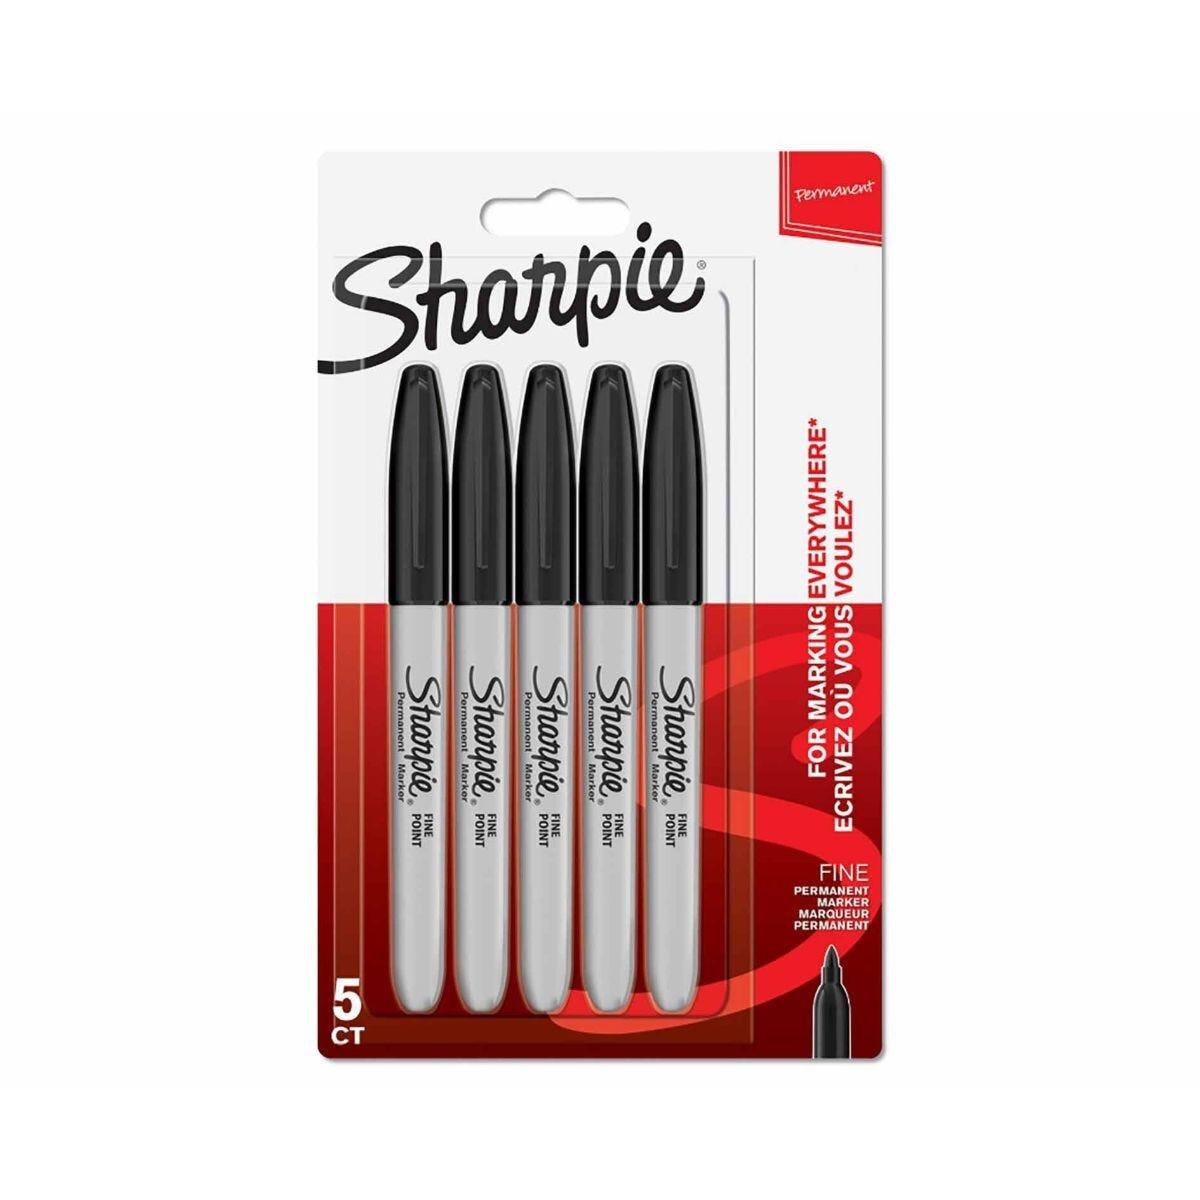 Sharpie Fine Marker Pen Pack of 5